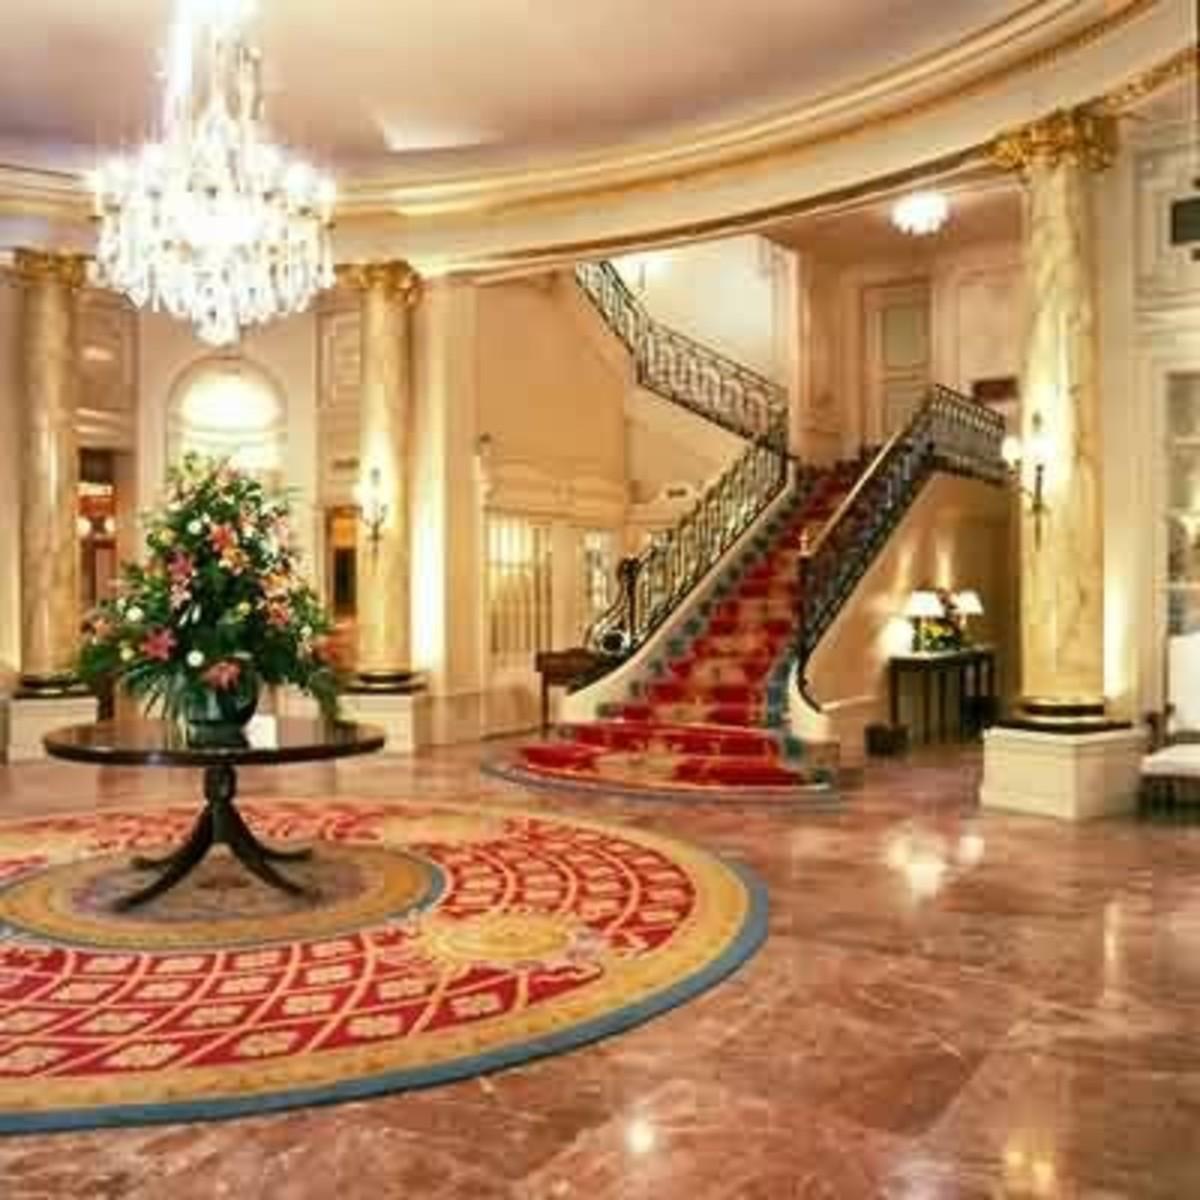 Main lobby at the Ritz.  Credit: www.whatahotel.com